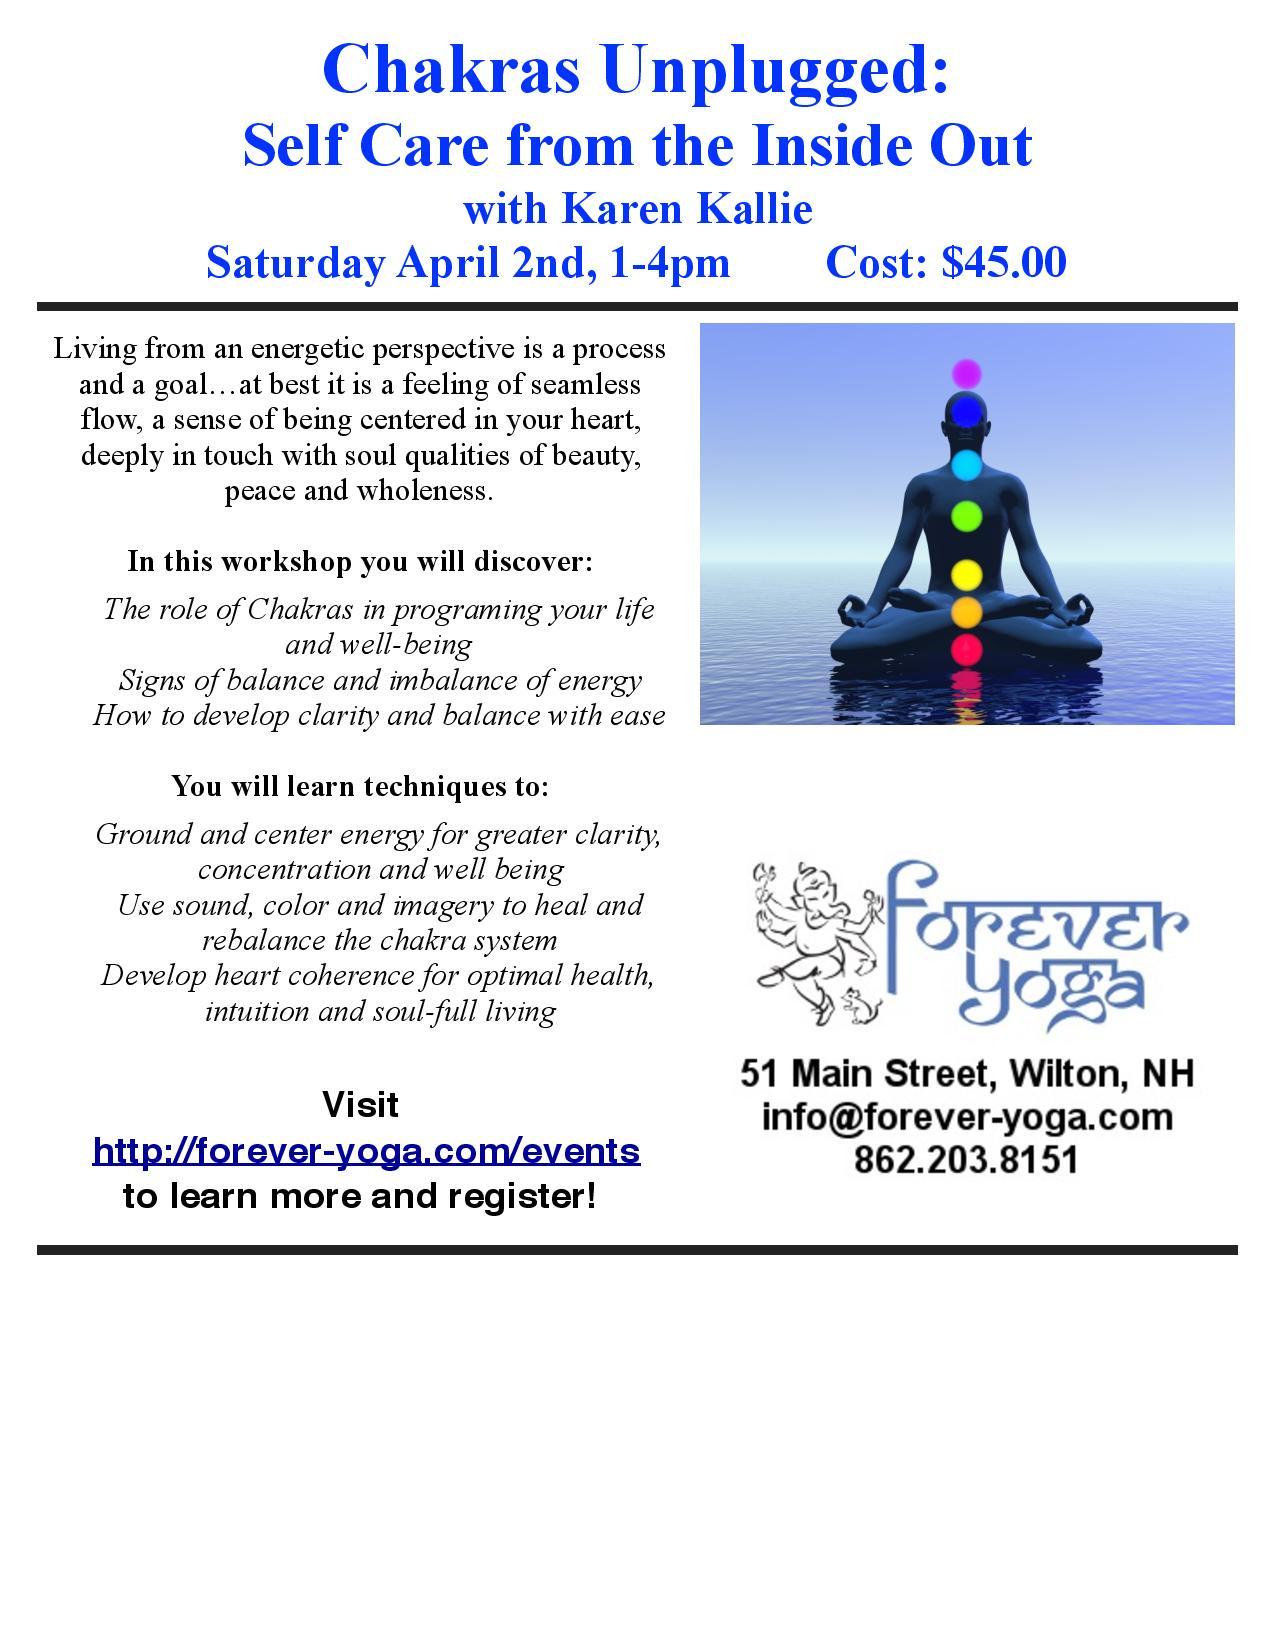 Chakras Unplugged Workshop April 2, 2016 in Wilton, NH